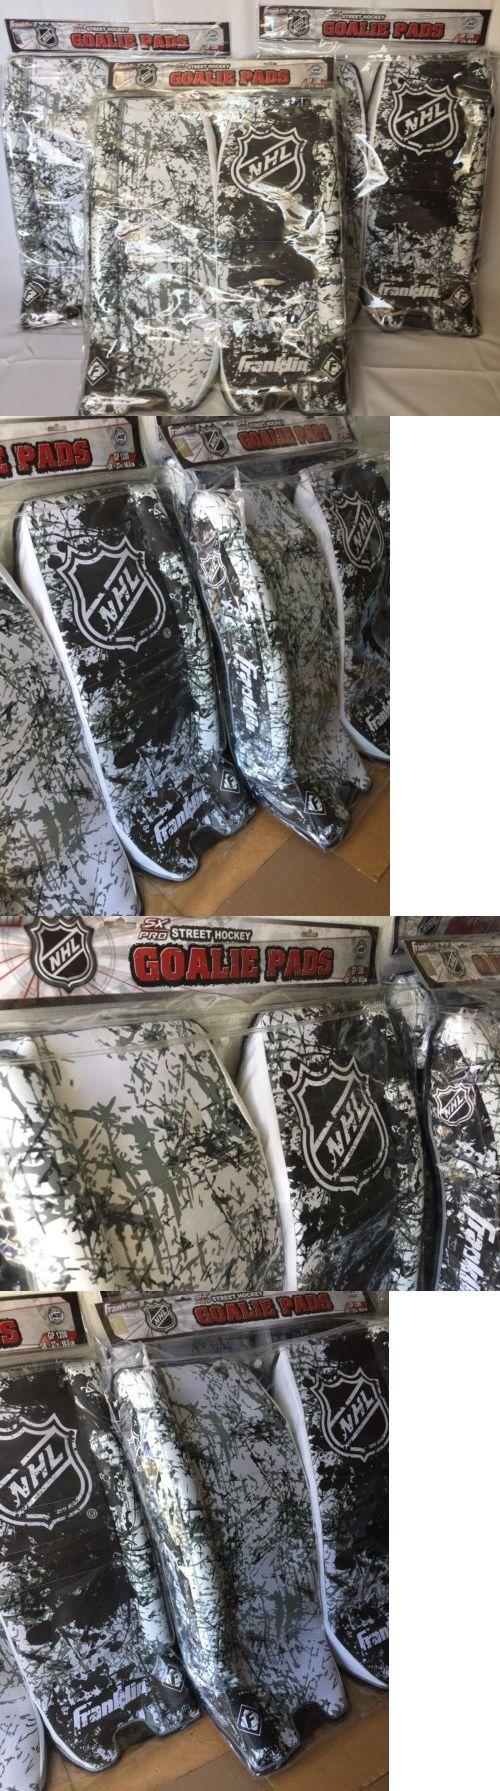 Leg Pads 79764: Street Hockey Goalie Pads, (Gp 1200 Jr-27In 68.5Cm) -> BUY IT NOW ONLY: $30 on eBay!